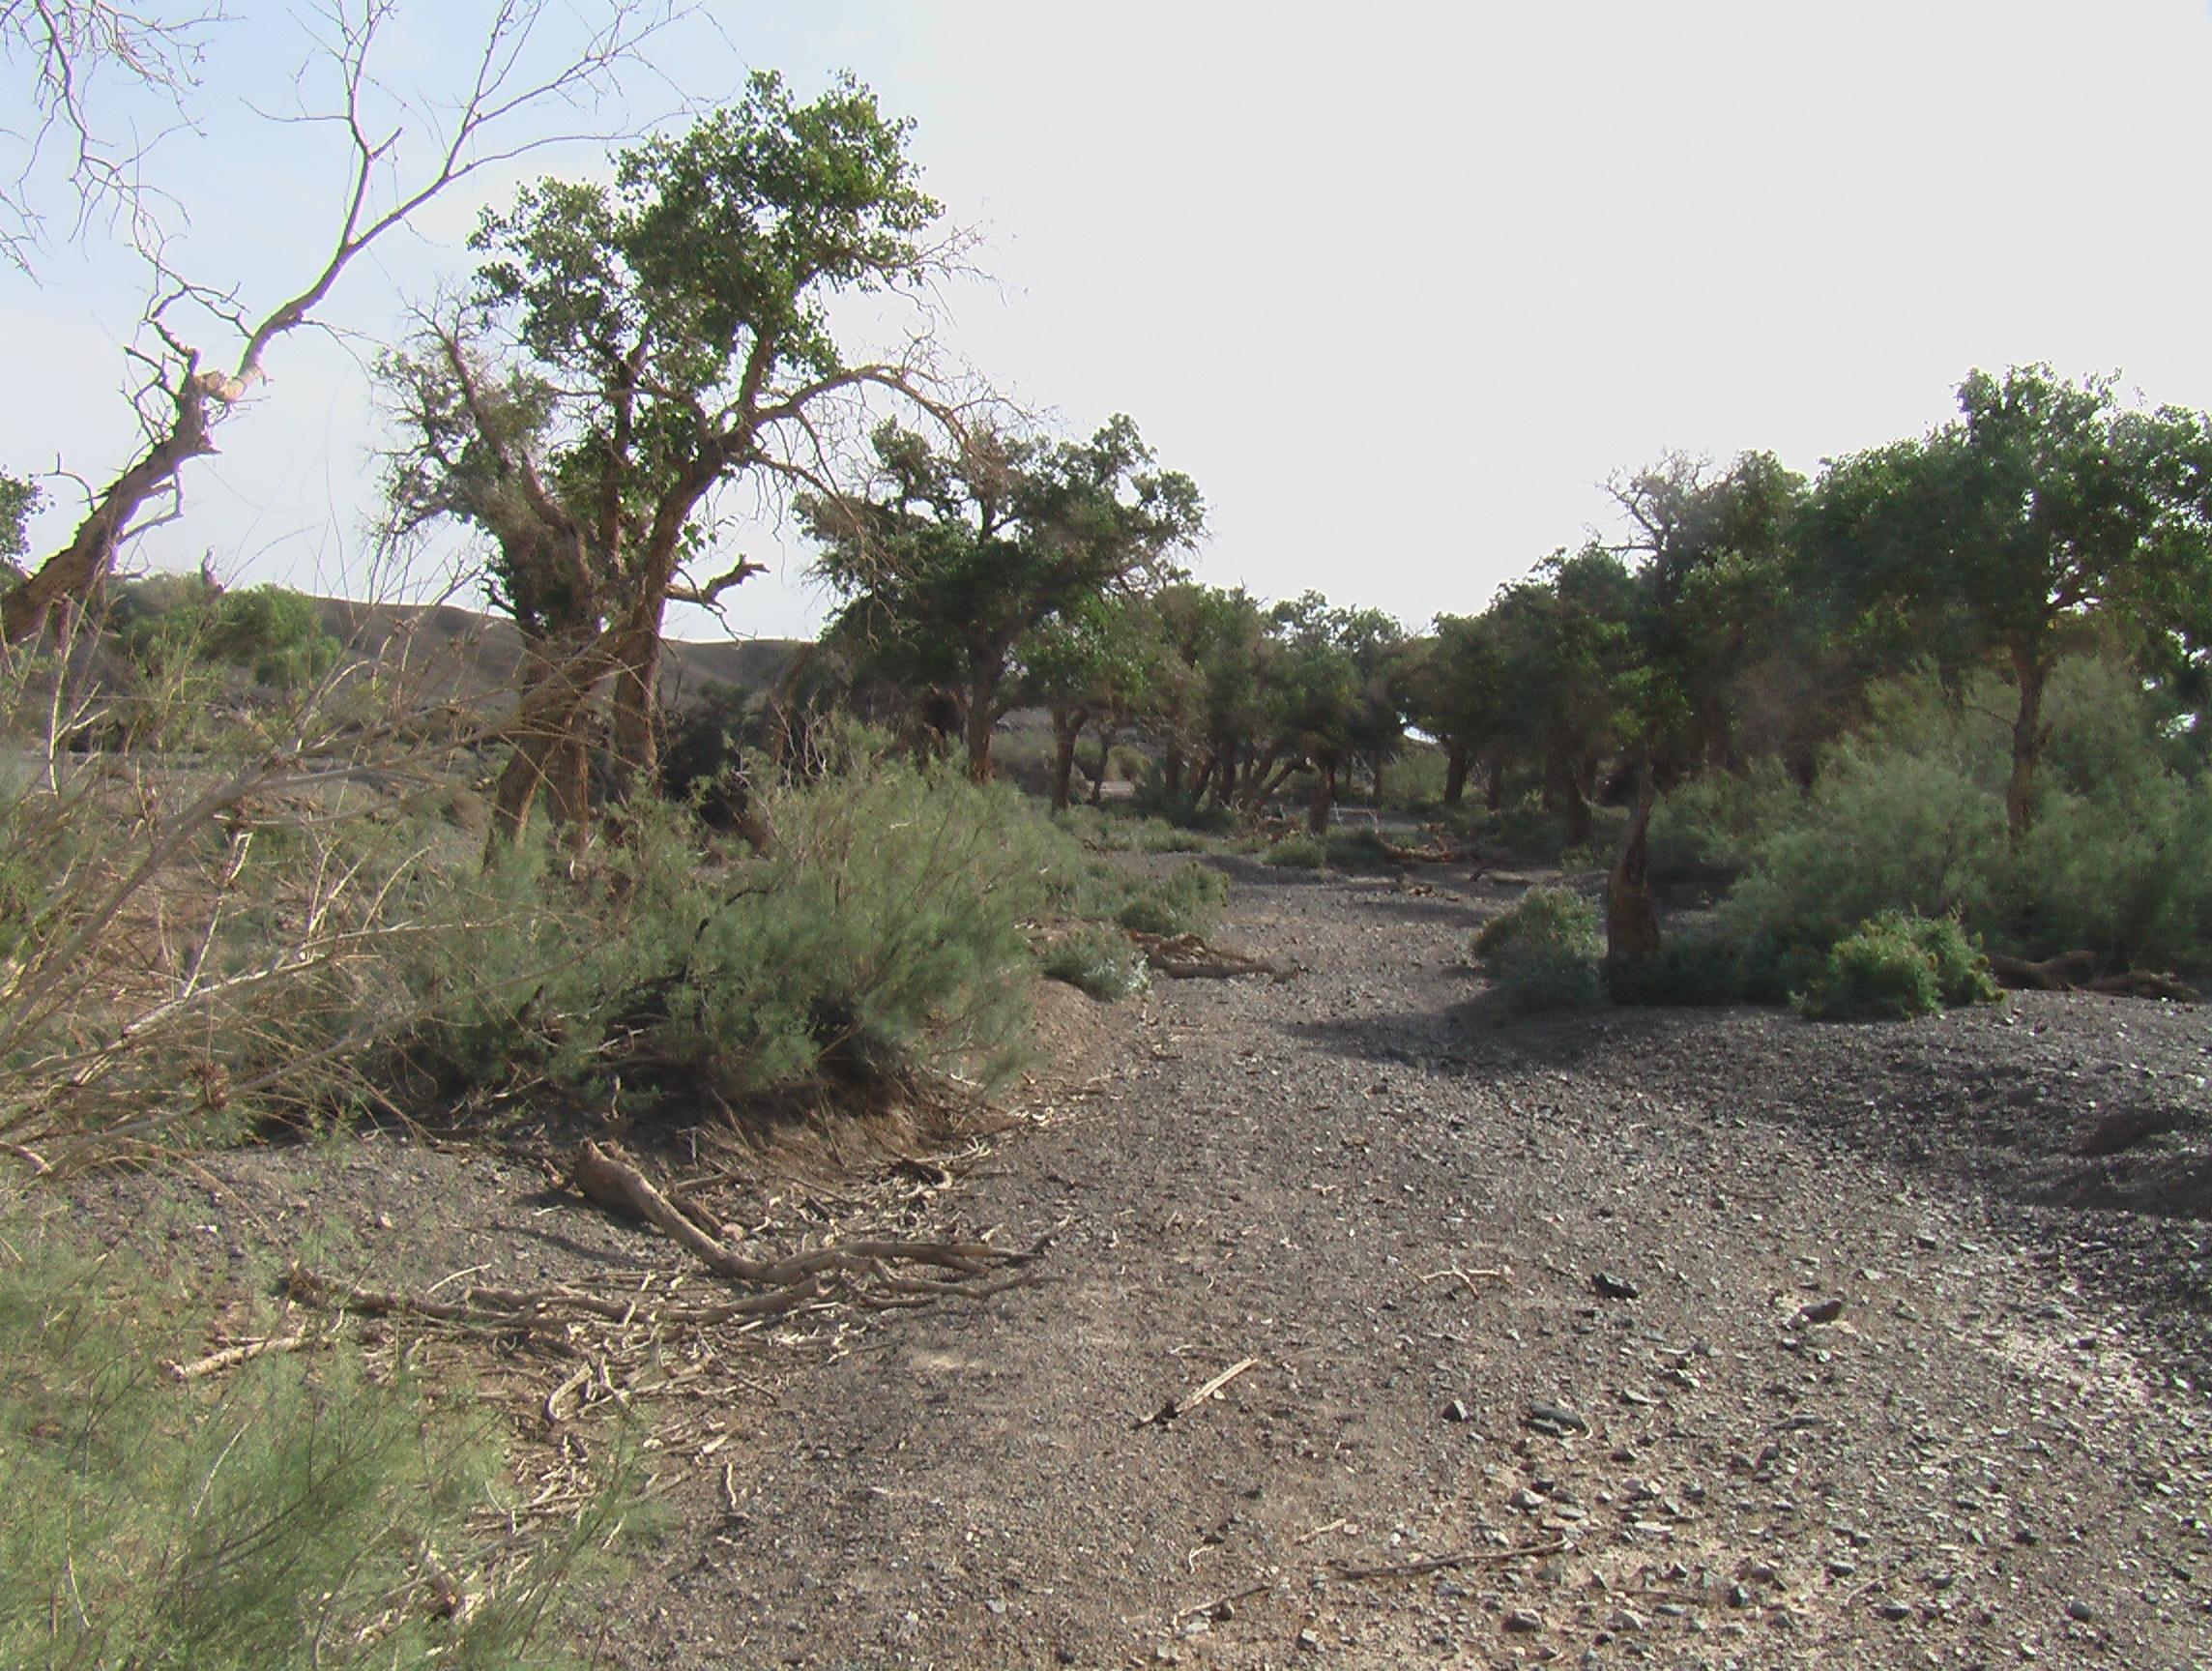 File:Populus diversifolia, Ekhiin-Gol oazis, Shinejinst ...